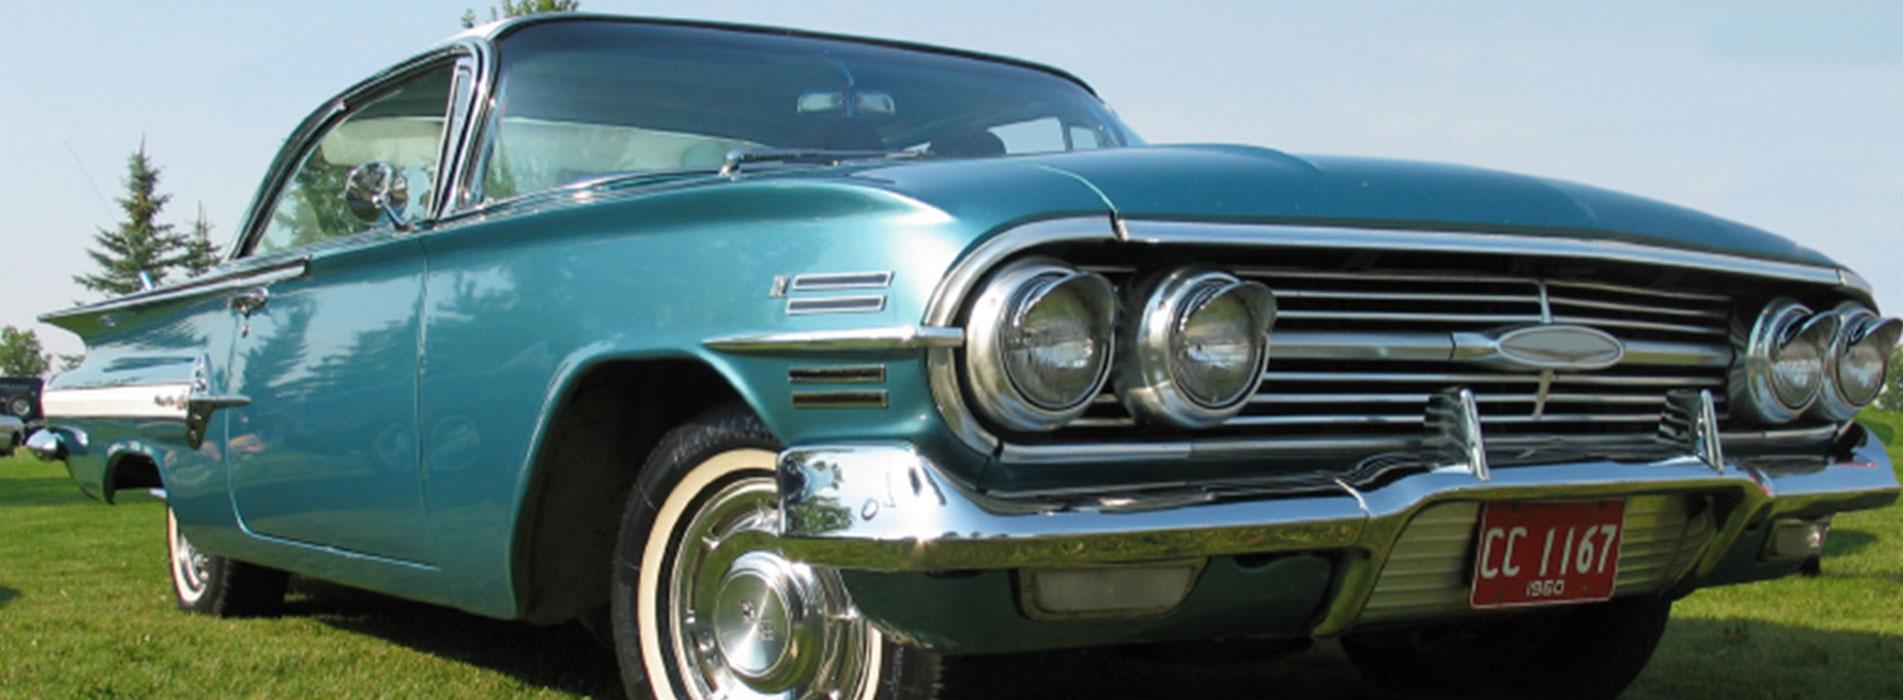 Four Oaks Nc Classic Car Insurance Agents Lee Insurance Agency Llc